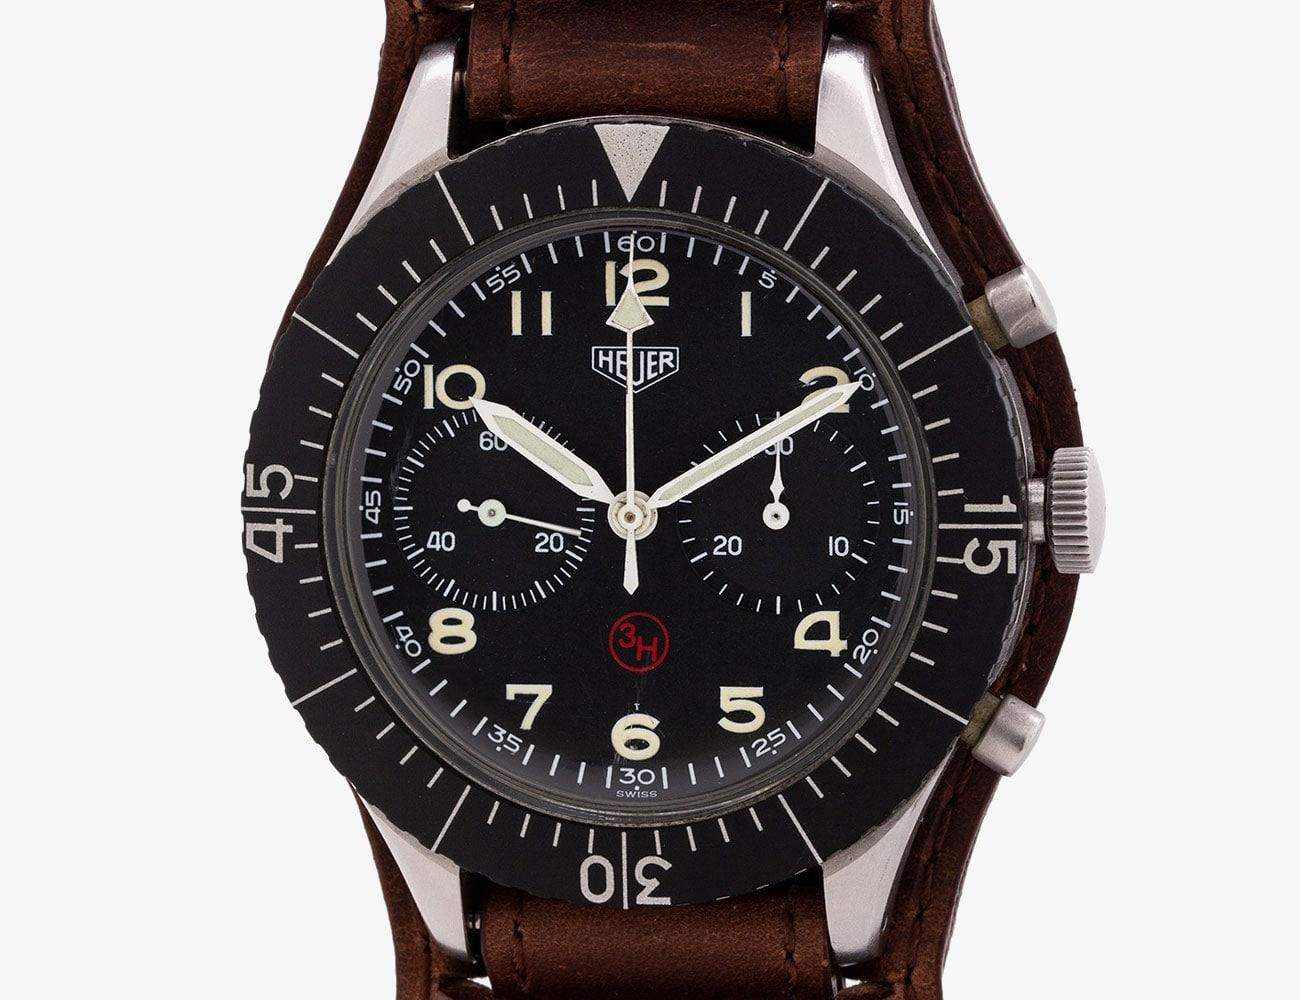 tag-heuer-chronograph-watch.jpg